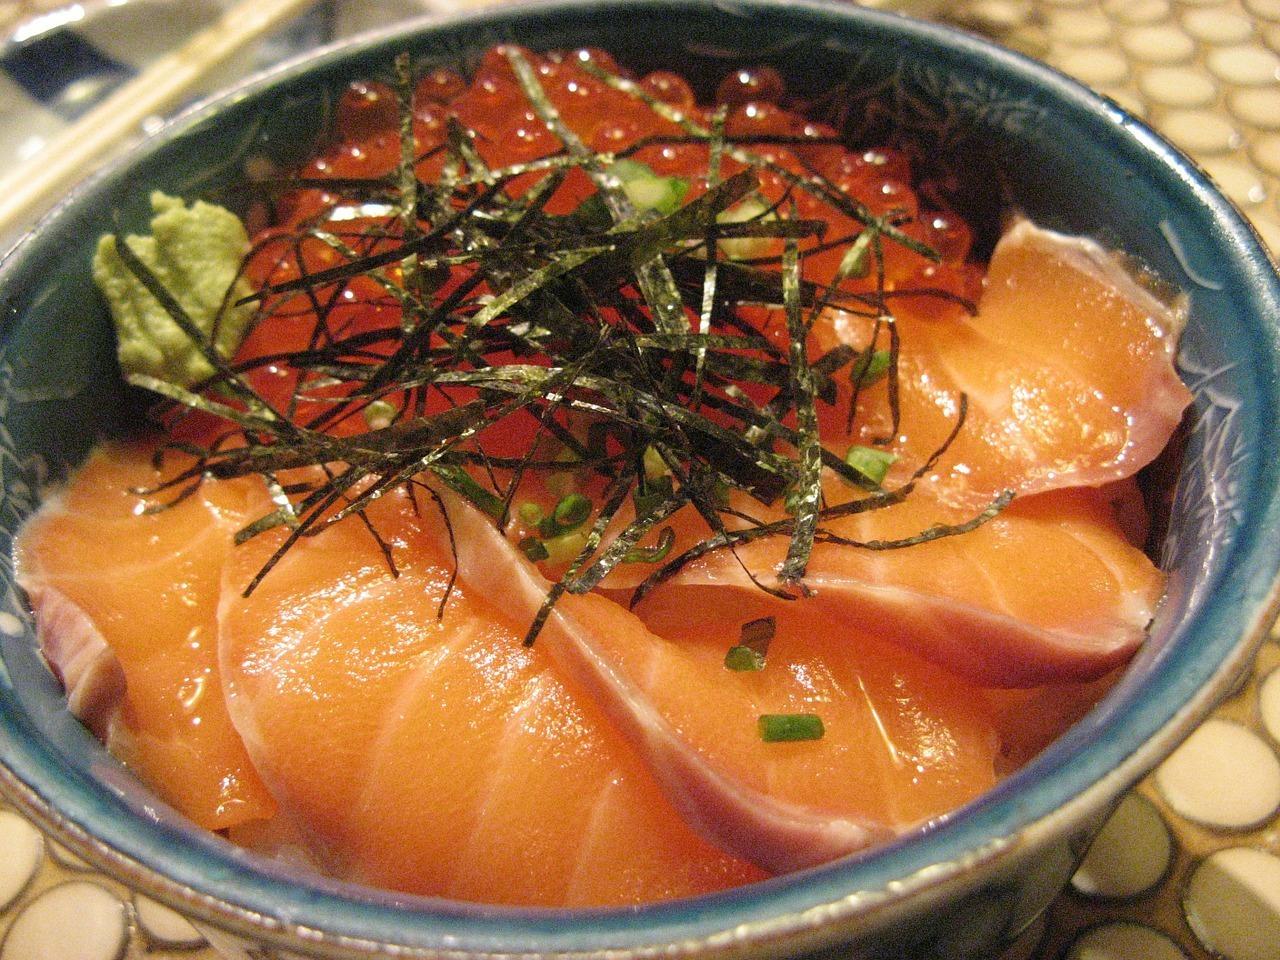 delicious-salmon-280467_1280.jpg